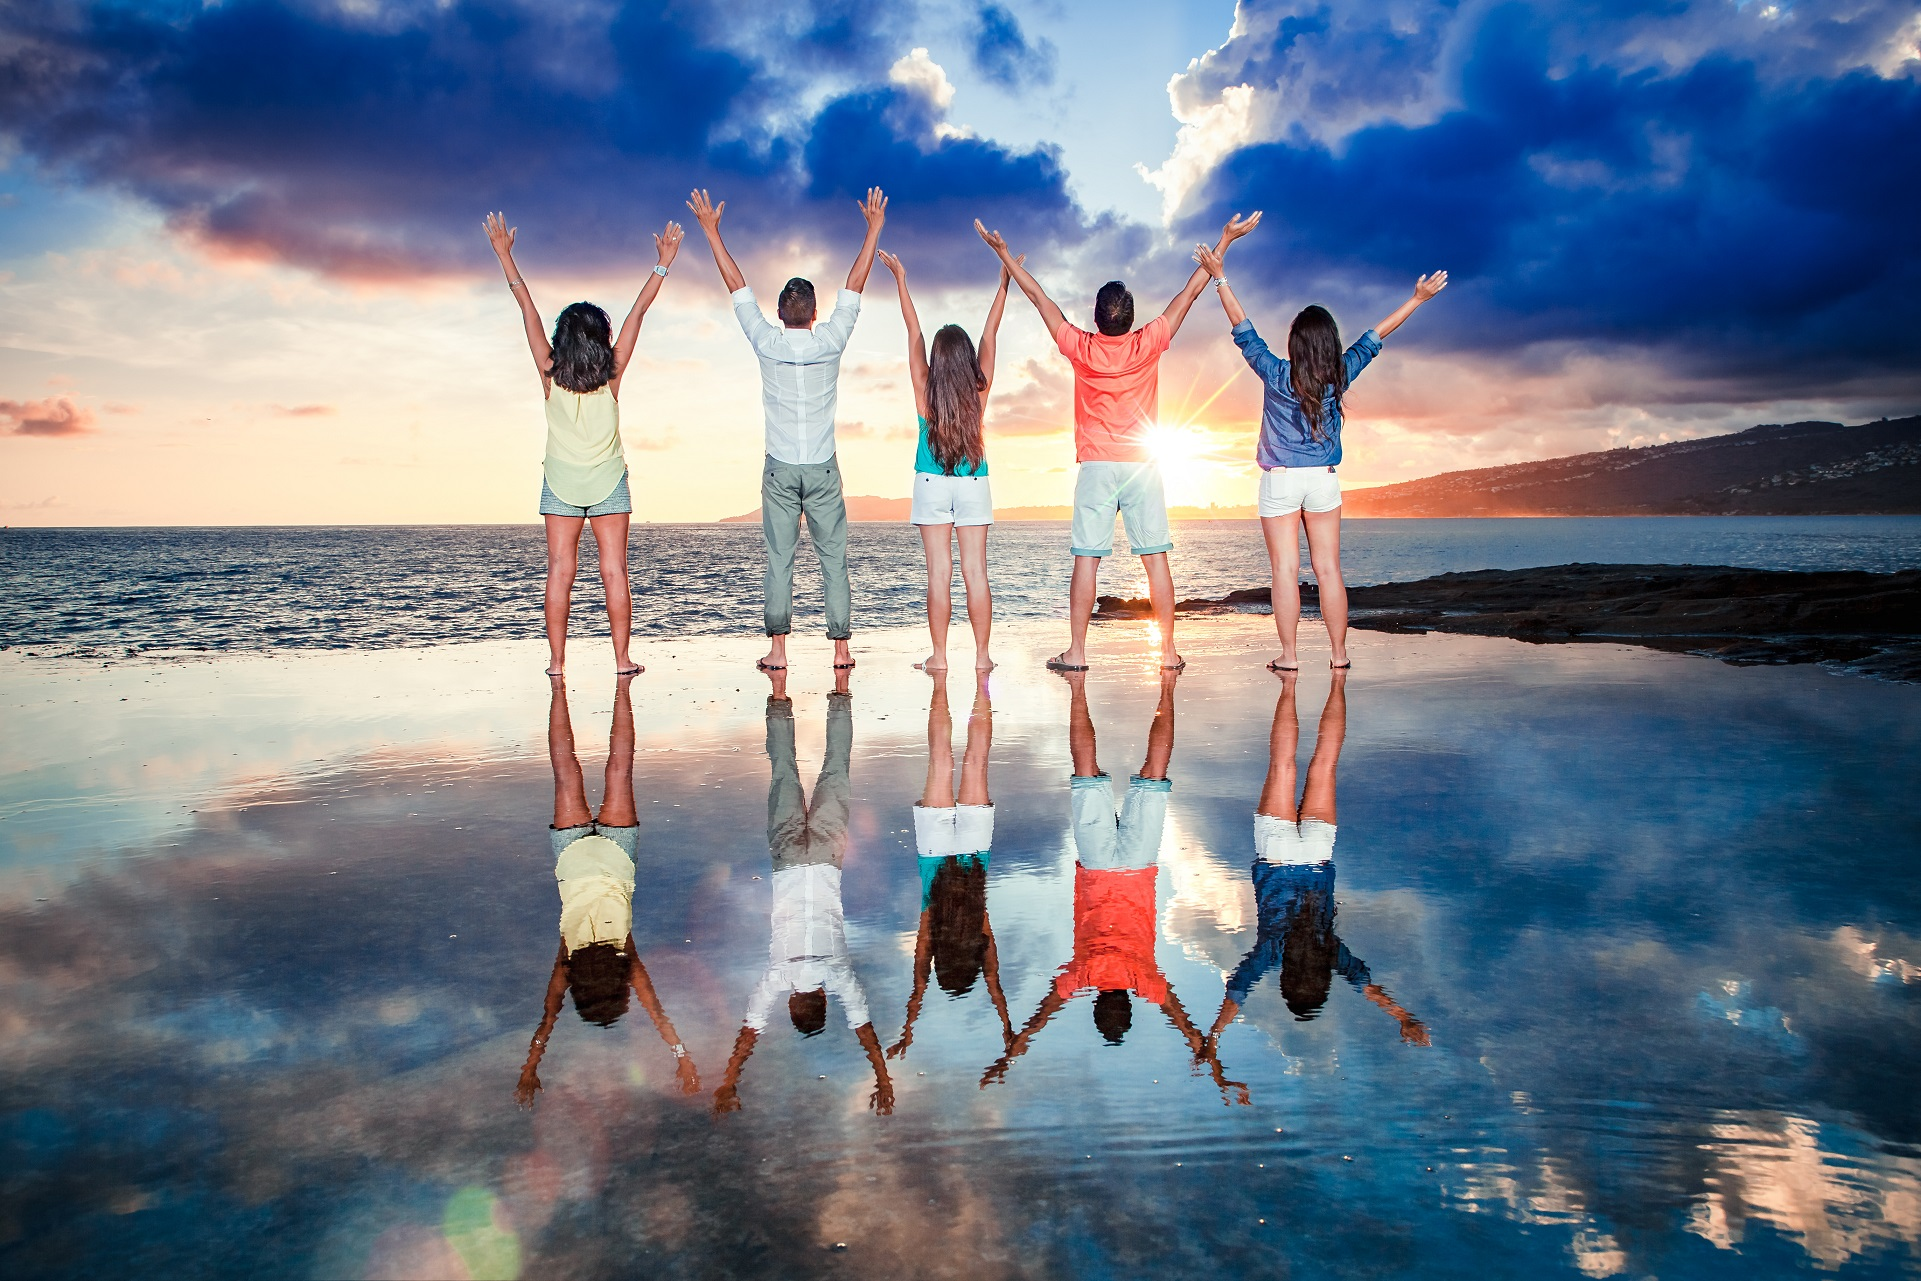 family reflection portrait photography tidepool sunset oahu hawaii ocean